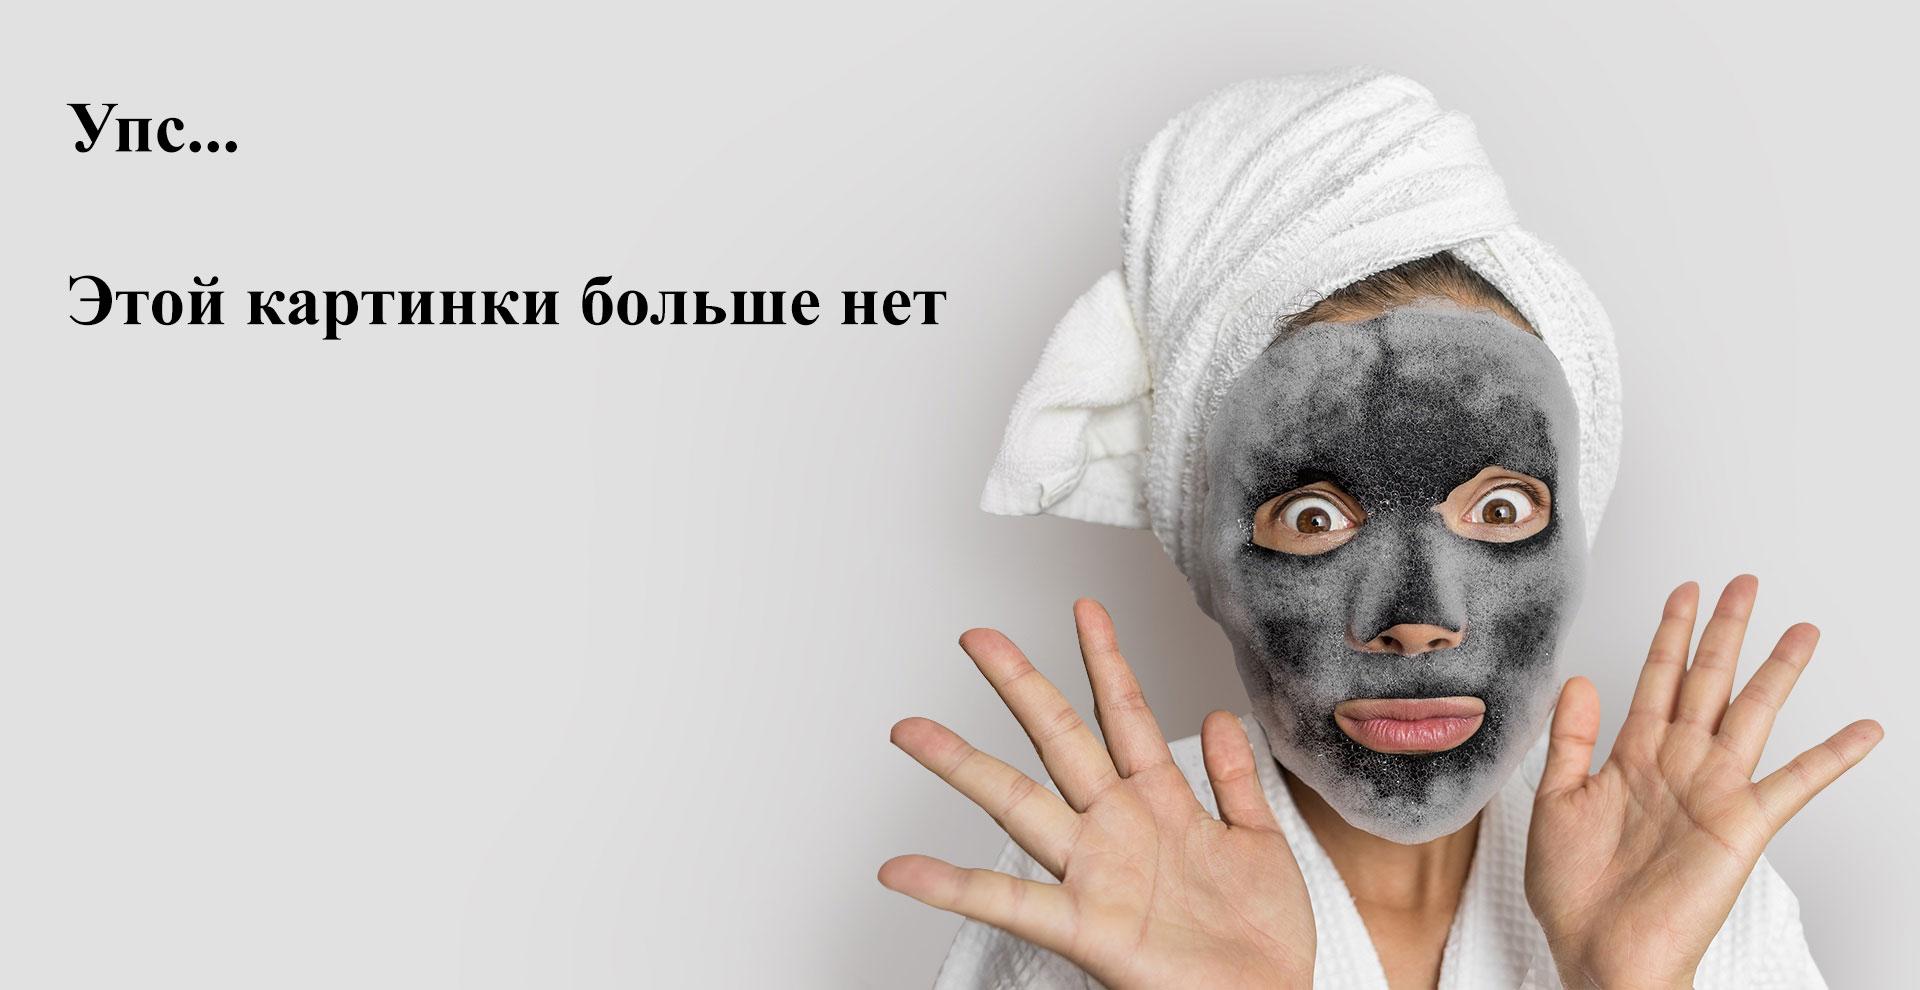 7 Days, Кератиновый филлер Mimimishki, 40 мл